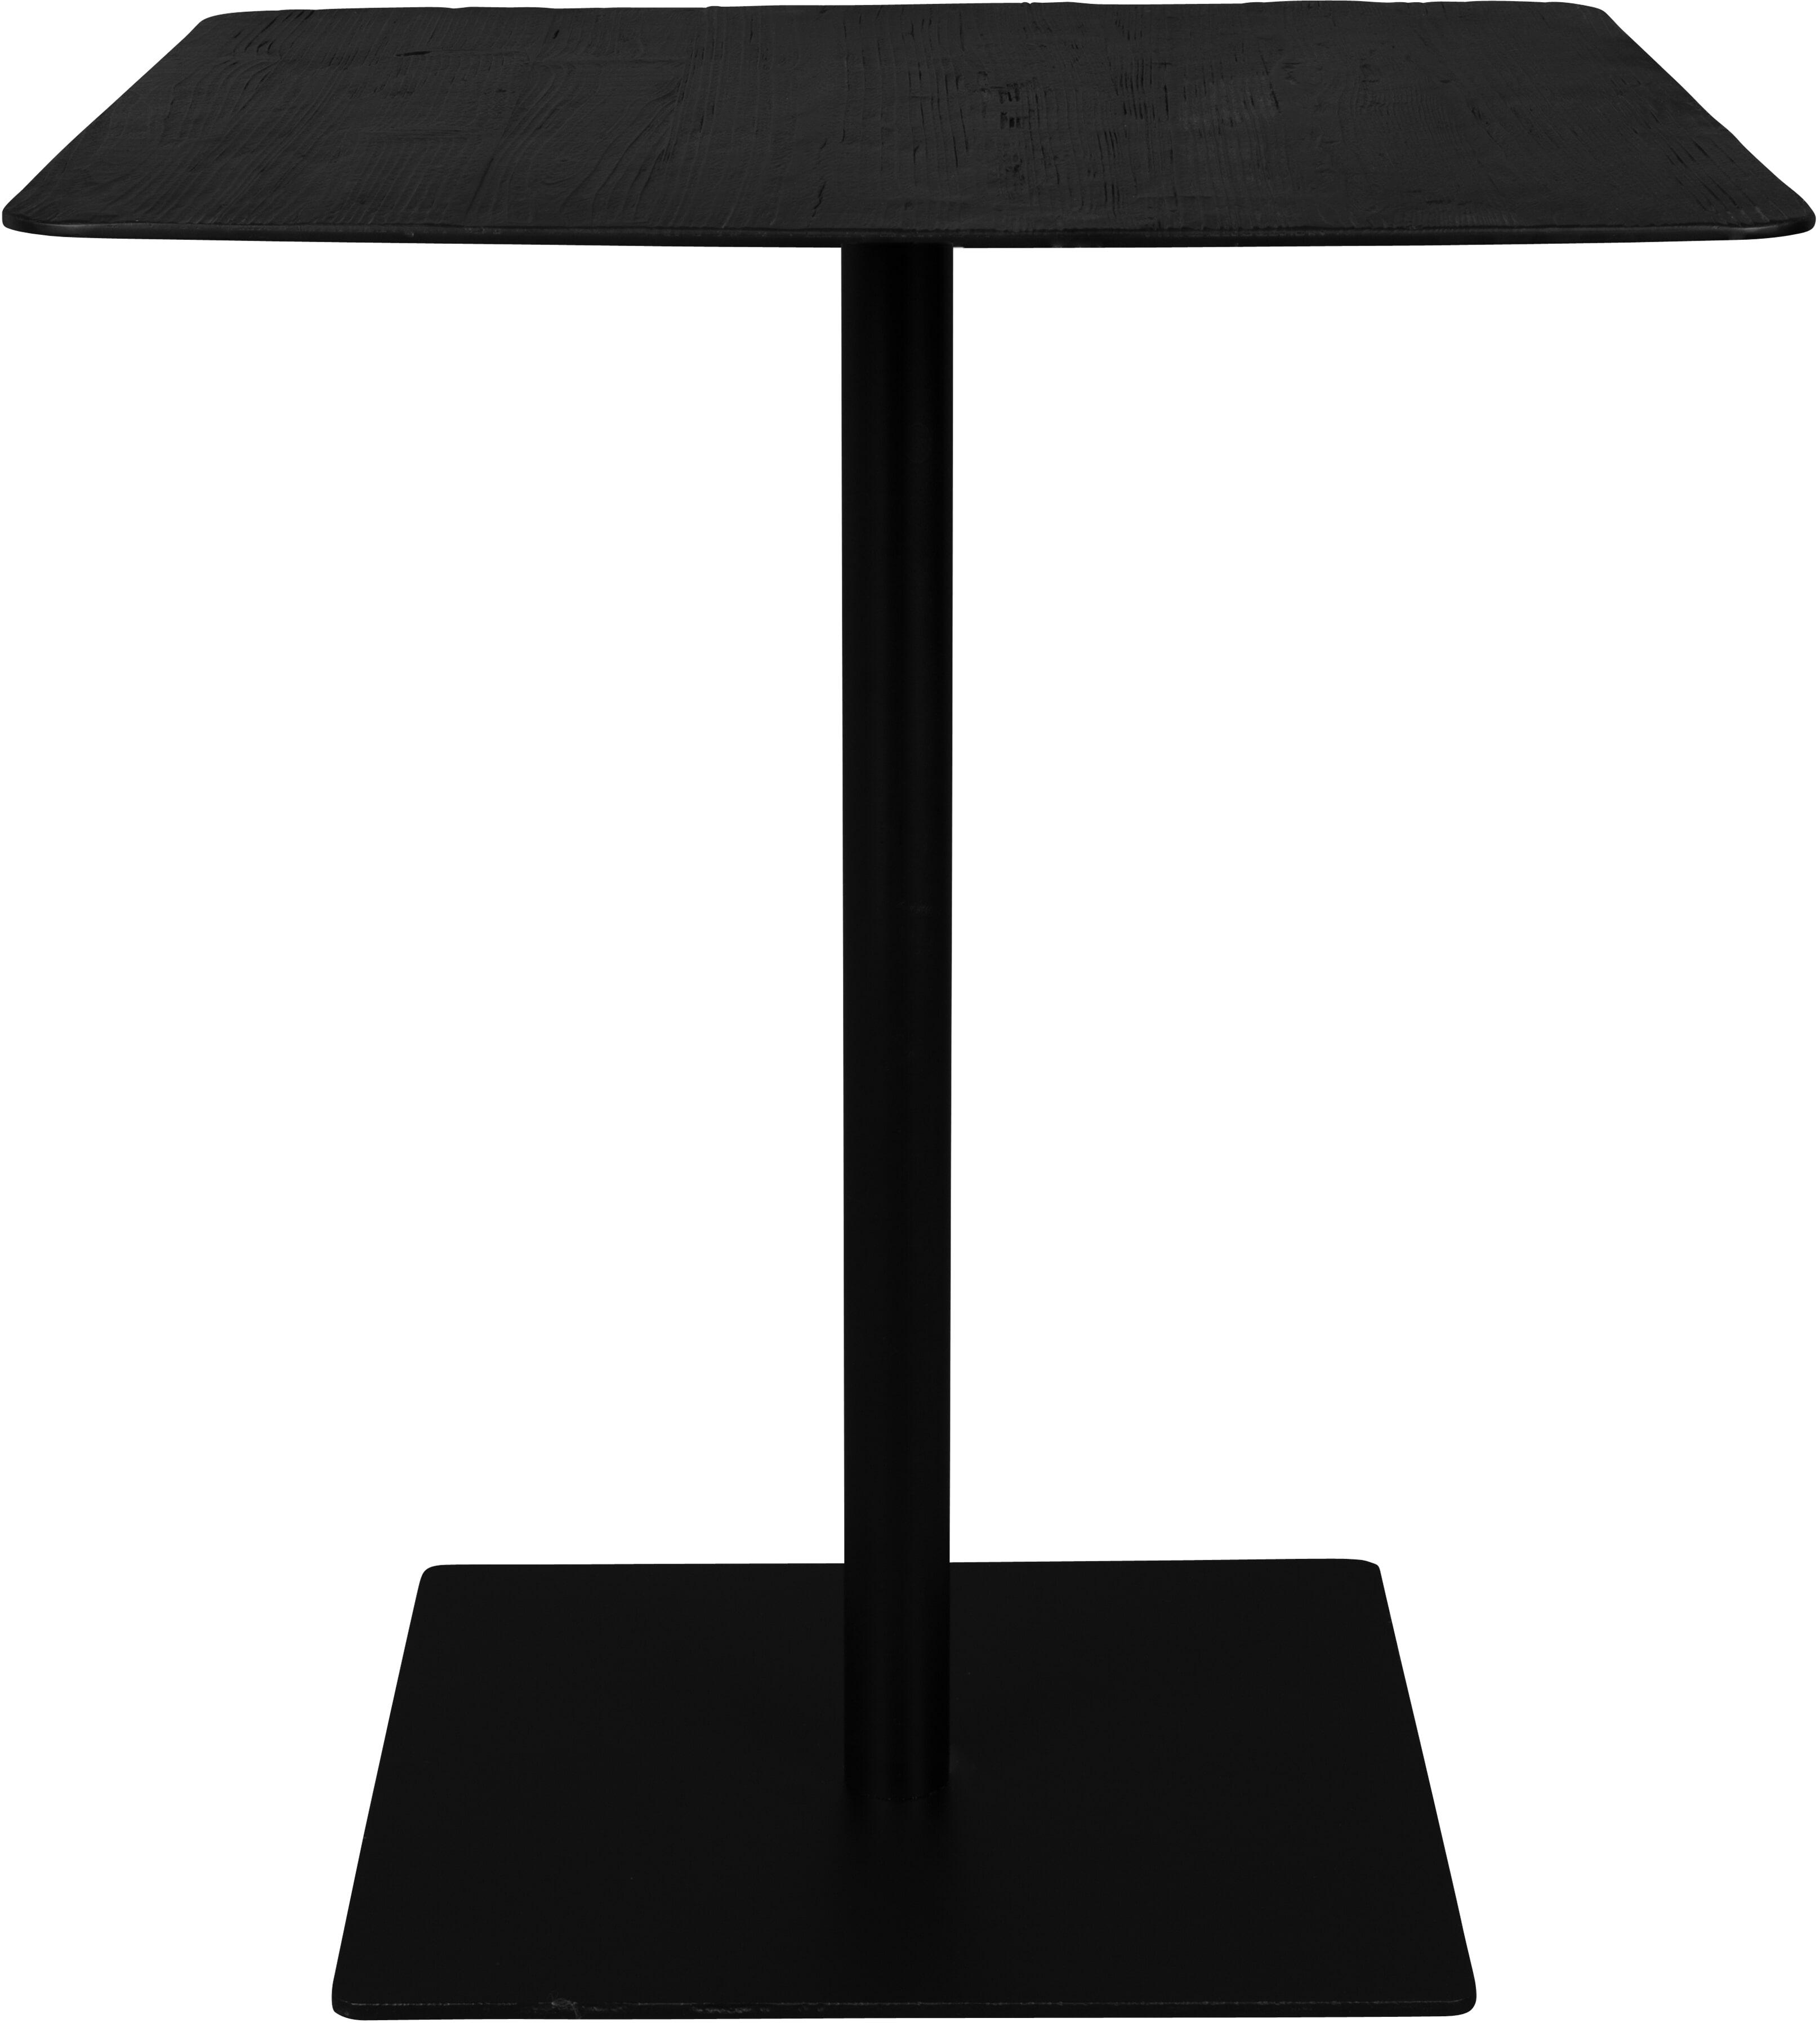 Dutchbone Vierkante Bartafel 'Braza' 70 x 70cm, kleur Zwart